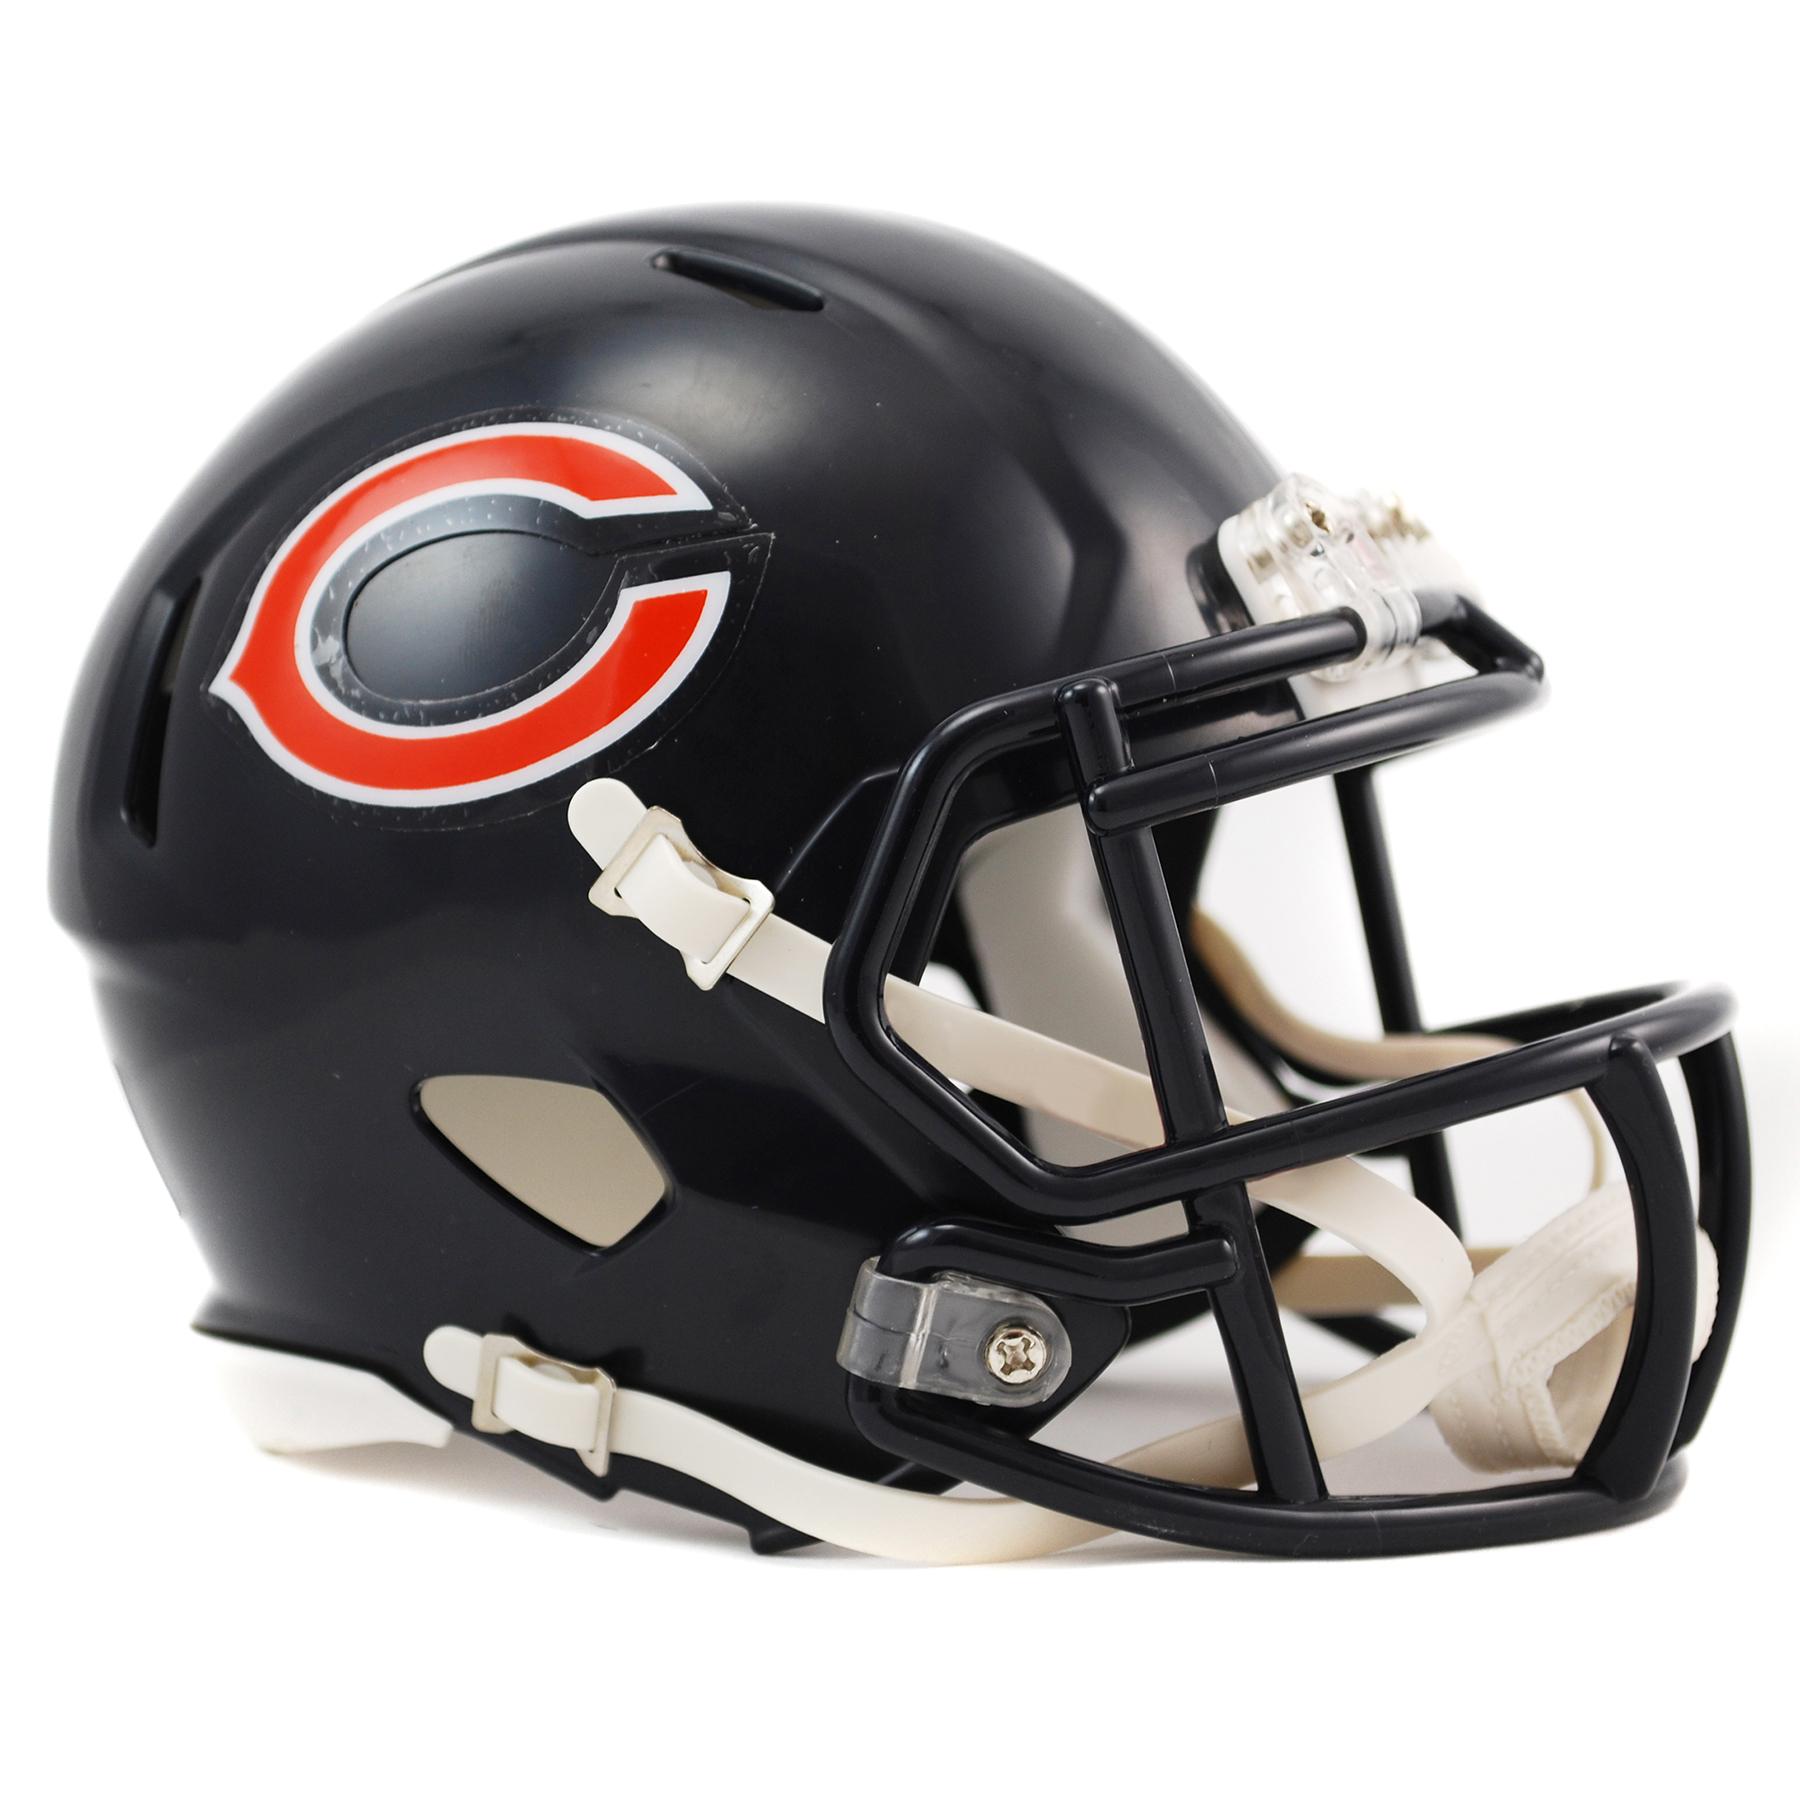 Chicago Bears Speed-Minihelm